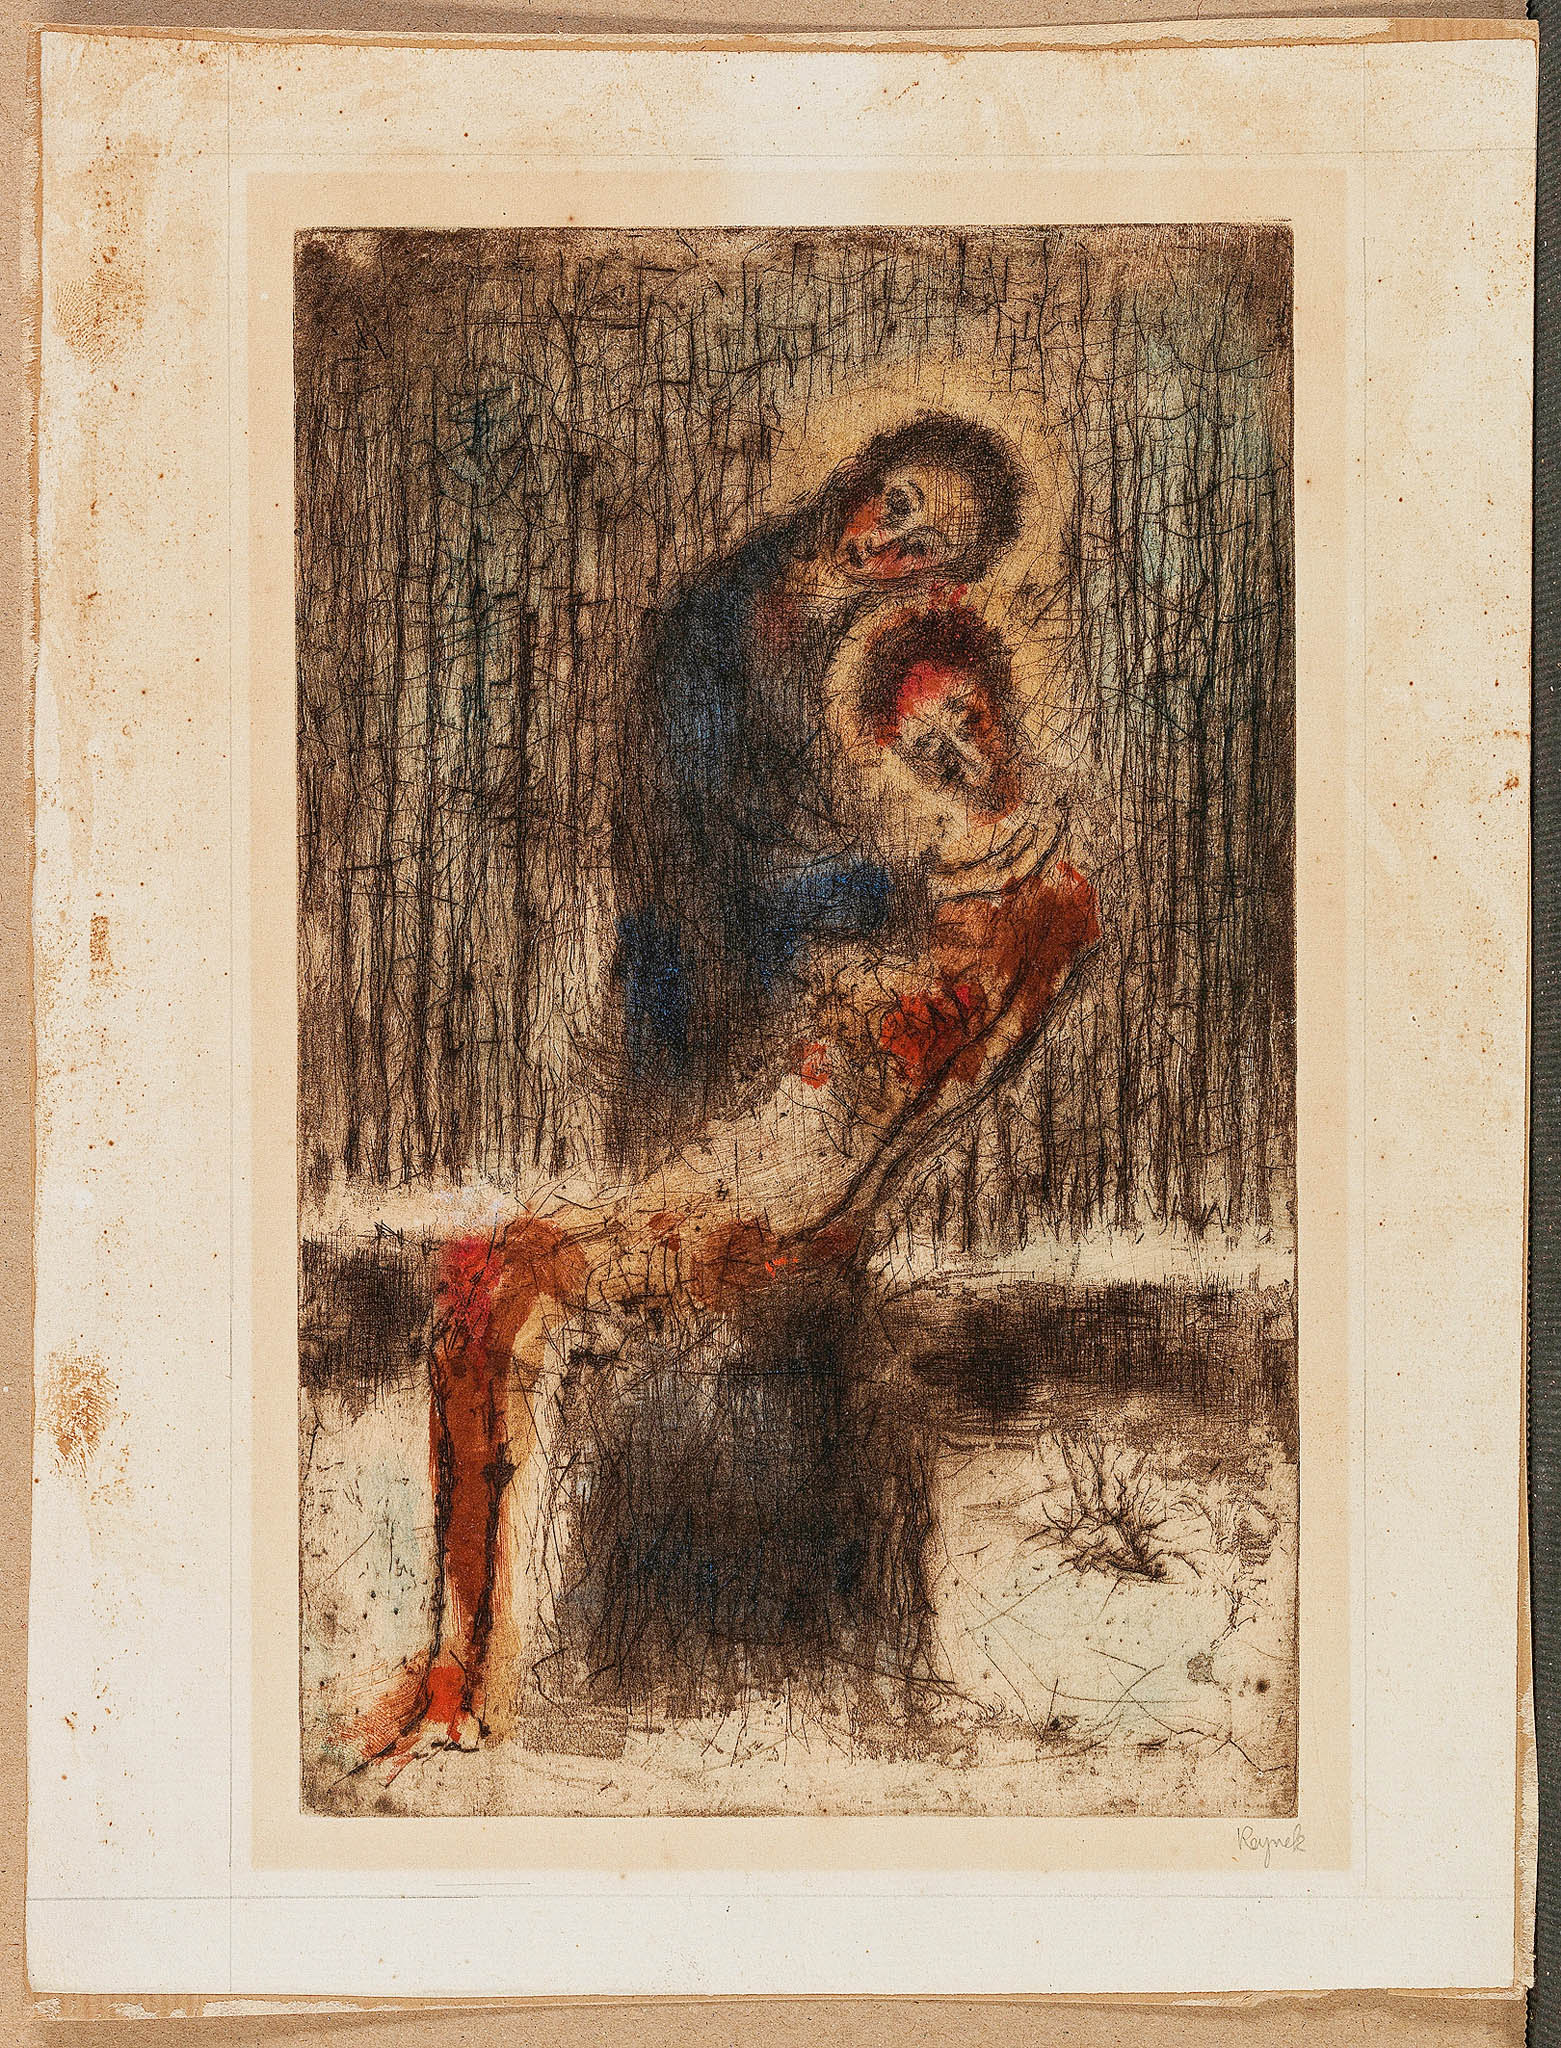 Bohuslav Reynek: Pieta vparku (Pieta smodrým pozadím), suchá jehla smonotypem napapíře, 24,4x15,6 centimetru,1955